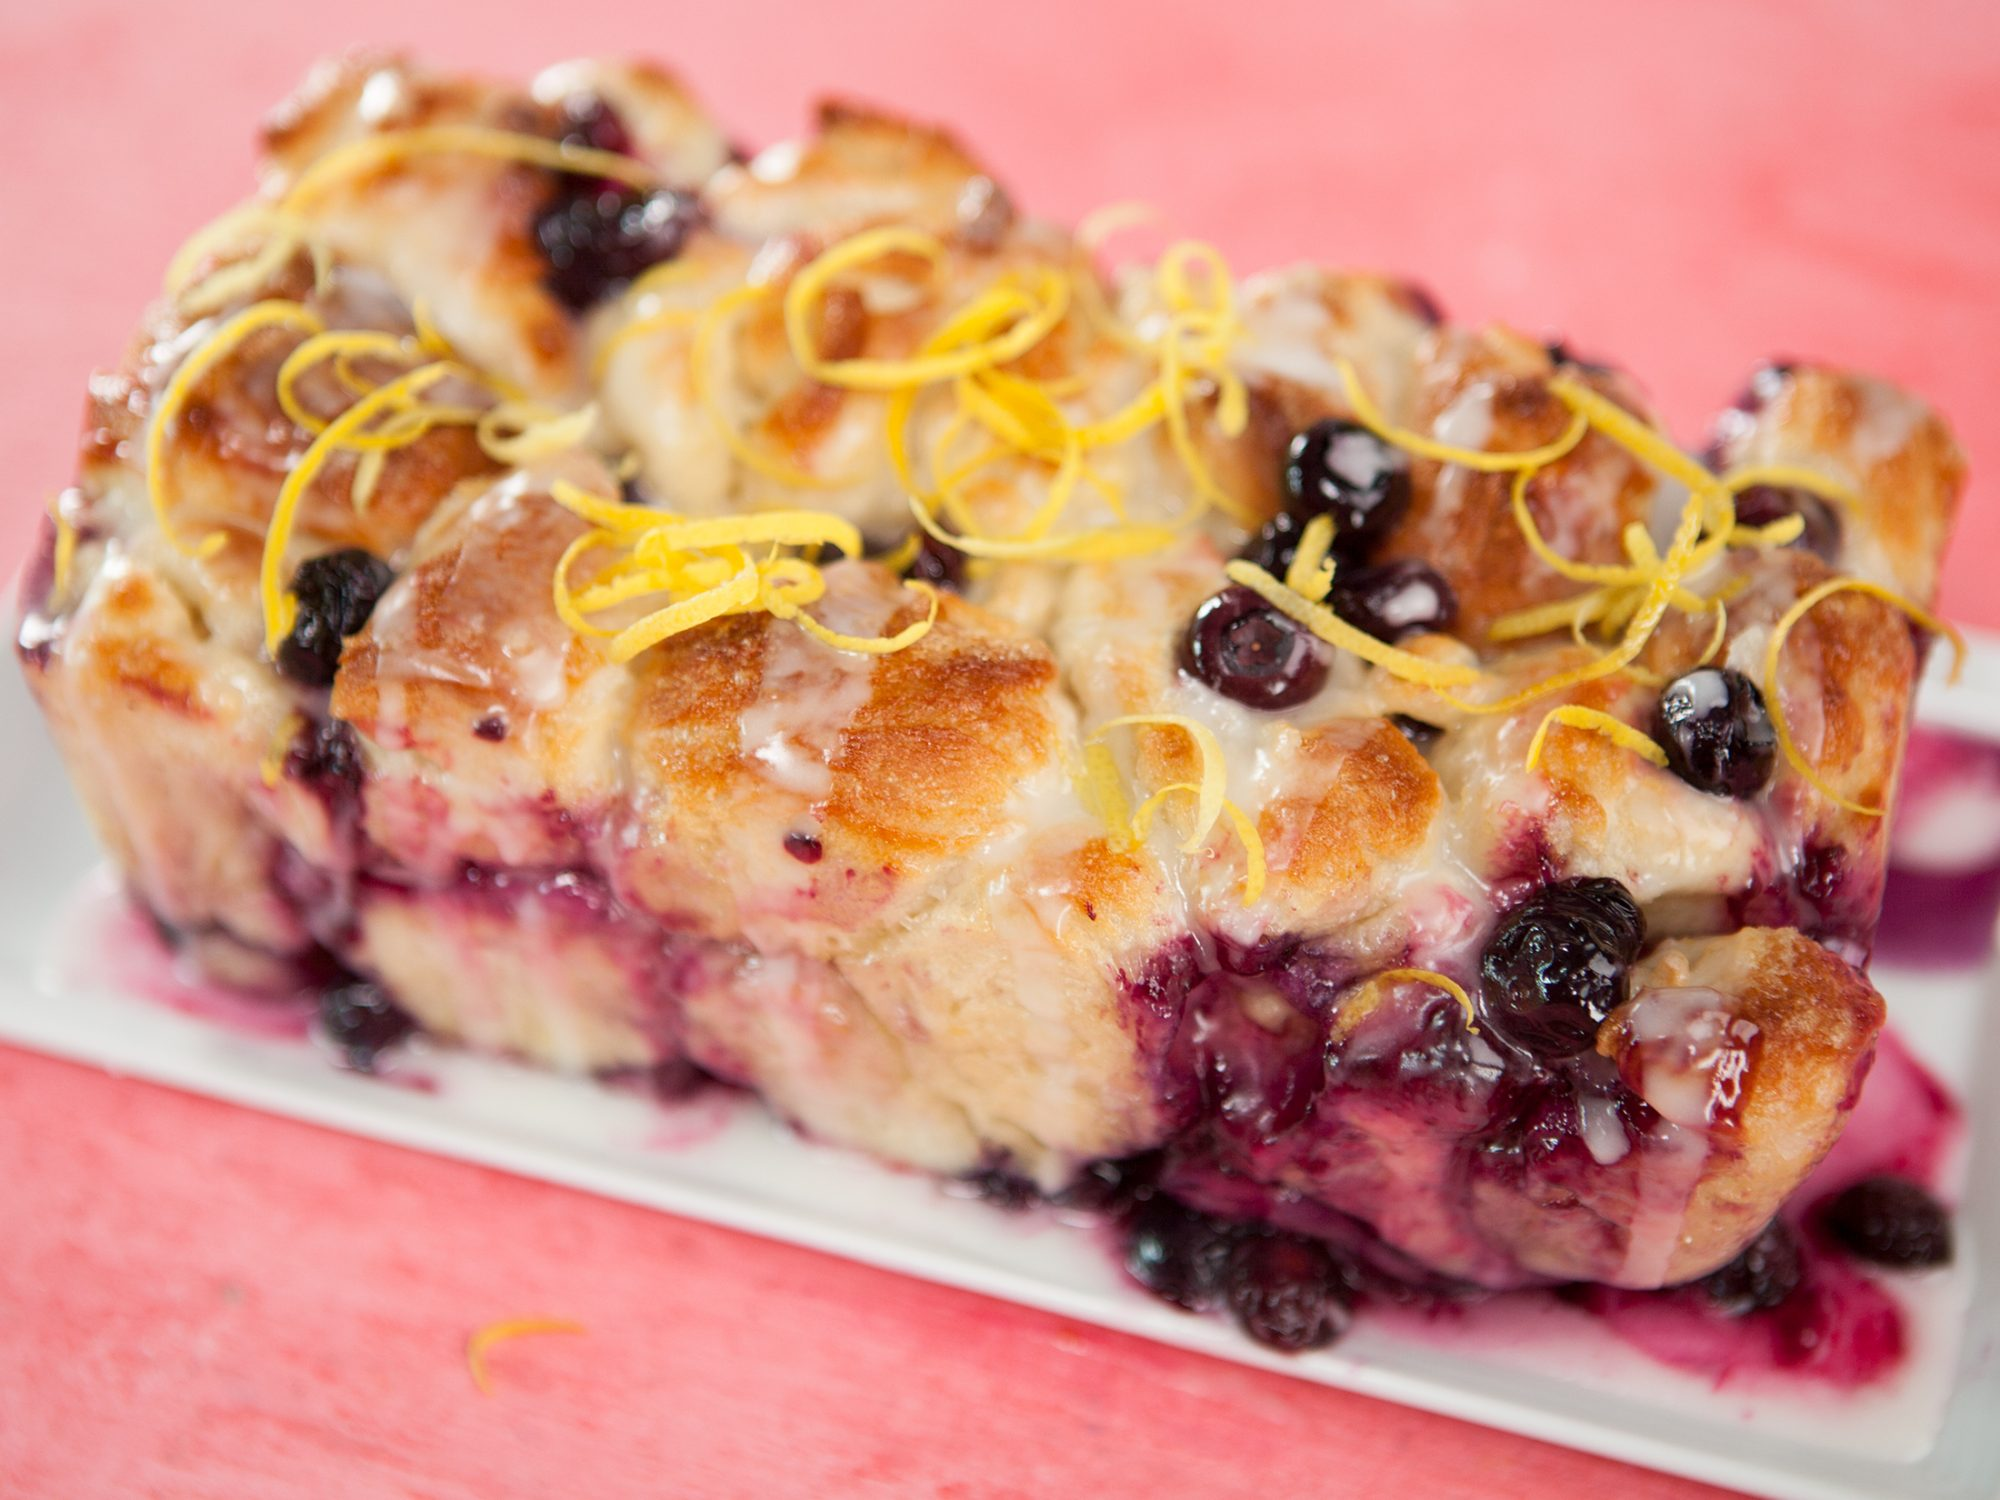 Blueberry Lemon Monkey Bread image